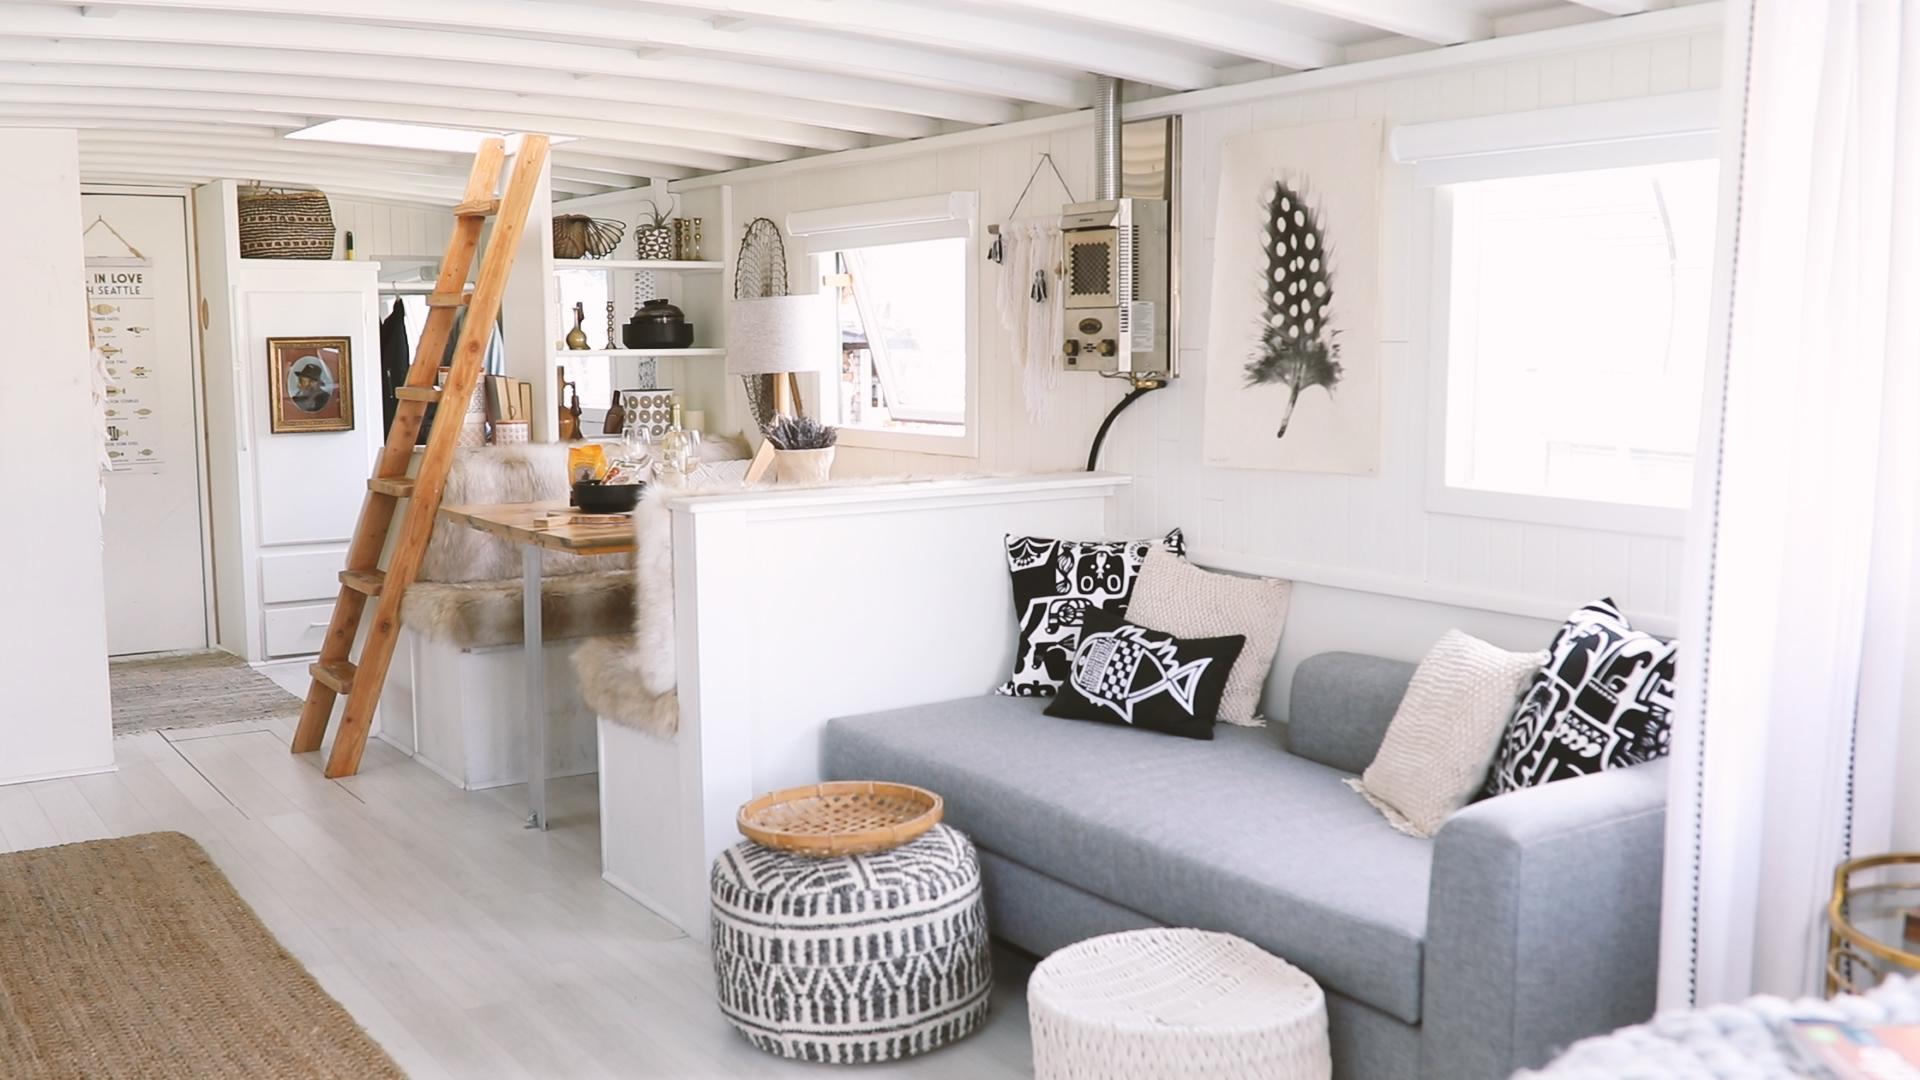 hygee_modern_boathouse_seattle_katherine_mendieta.jpg